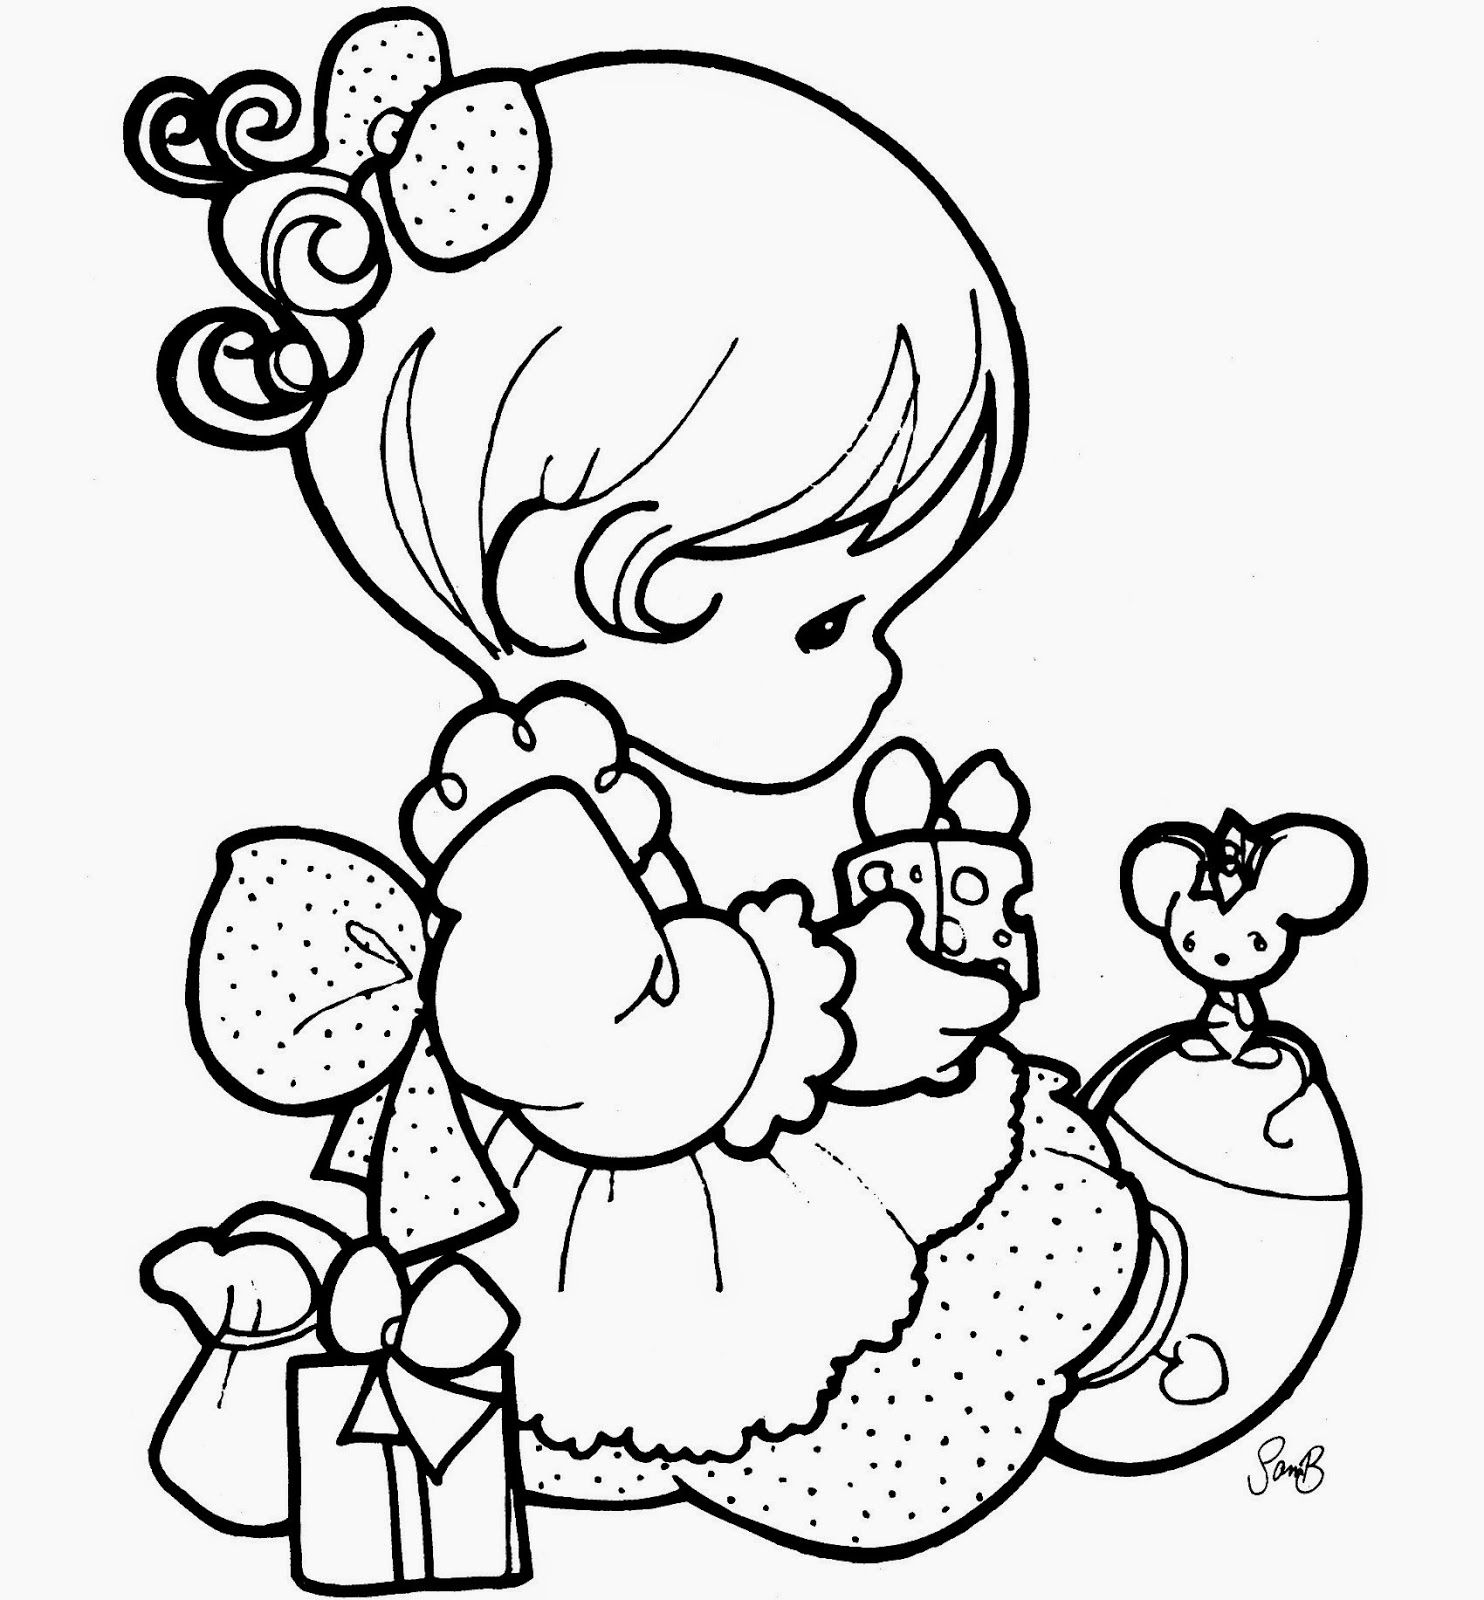 coloring pages precious moments. Beautiful Precious Moments Girl Coloring Page for Kids of a Cute Cartoon  Colour Drawing HD Wallpaper